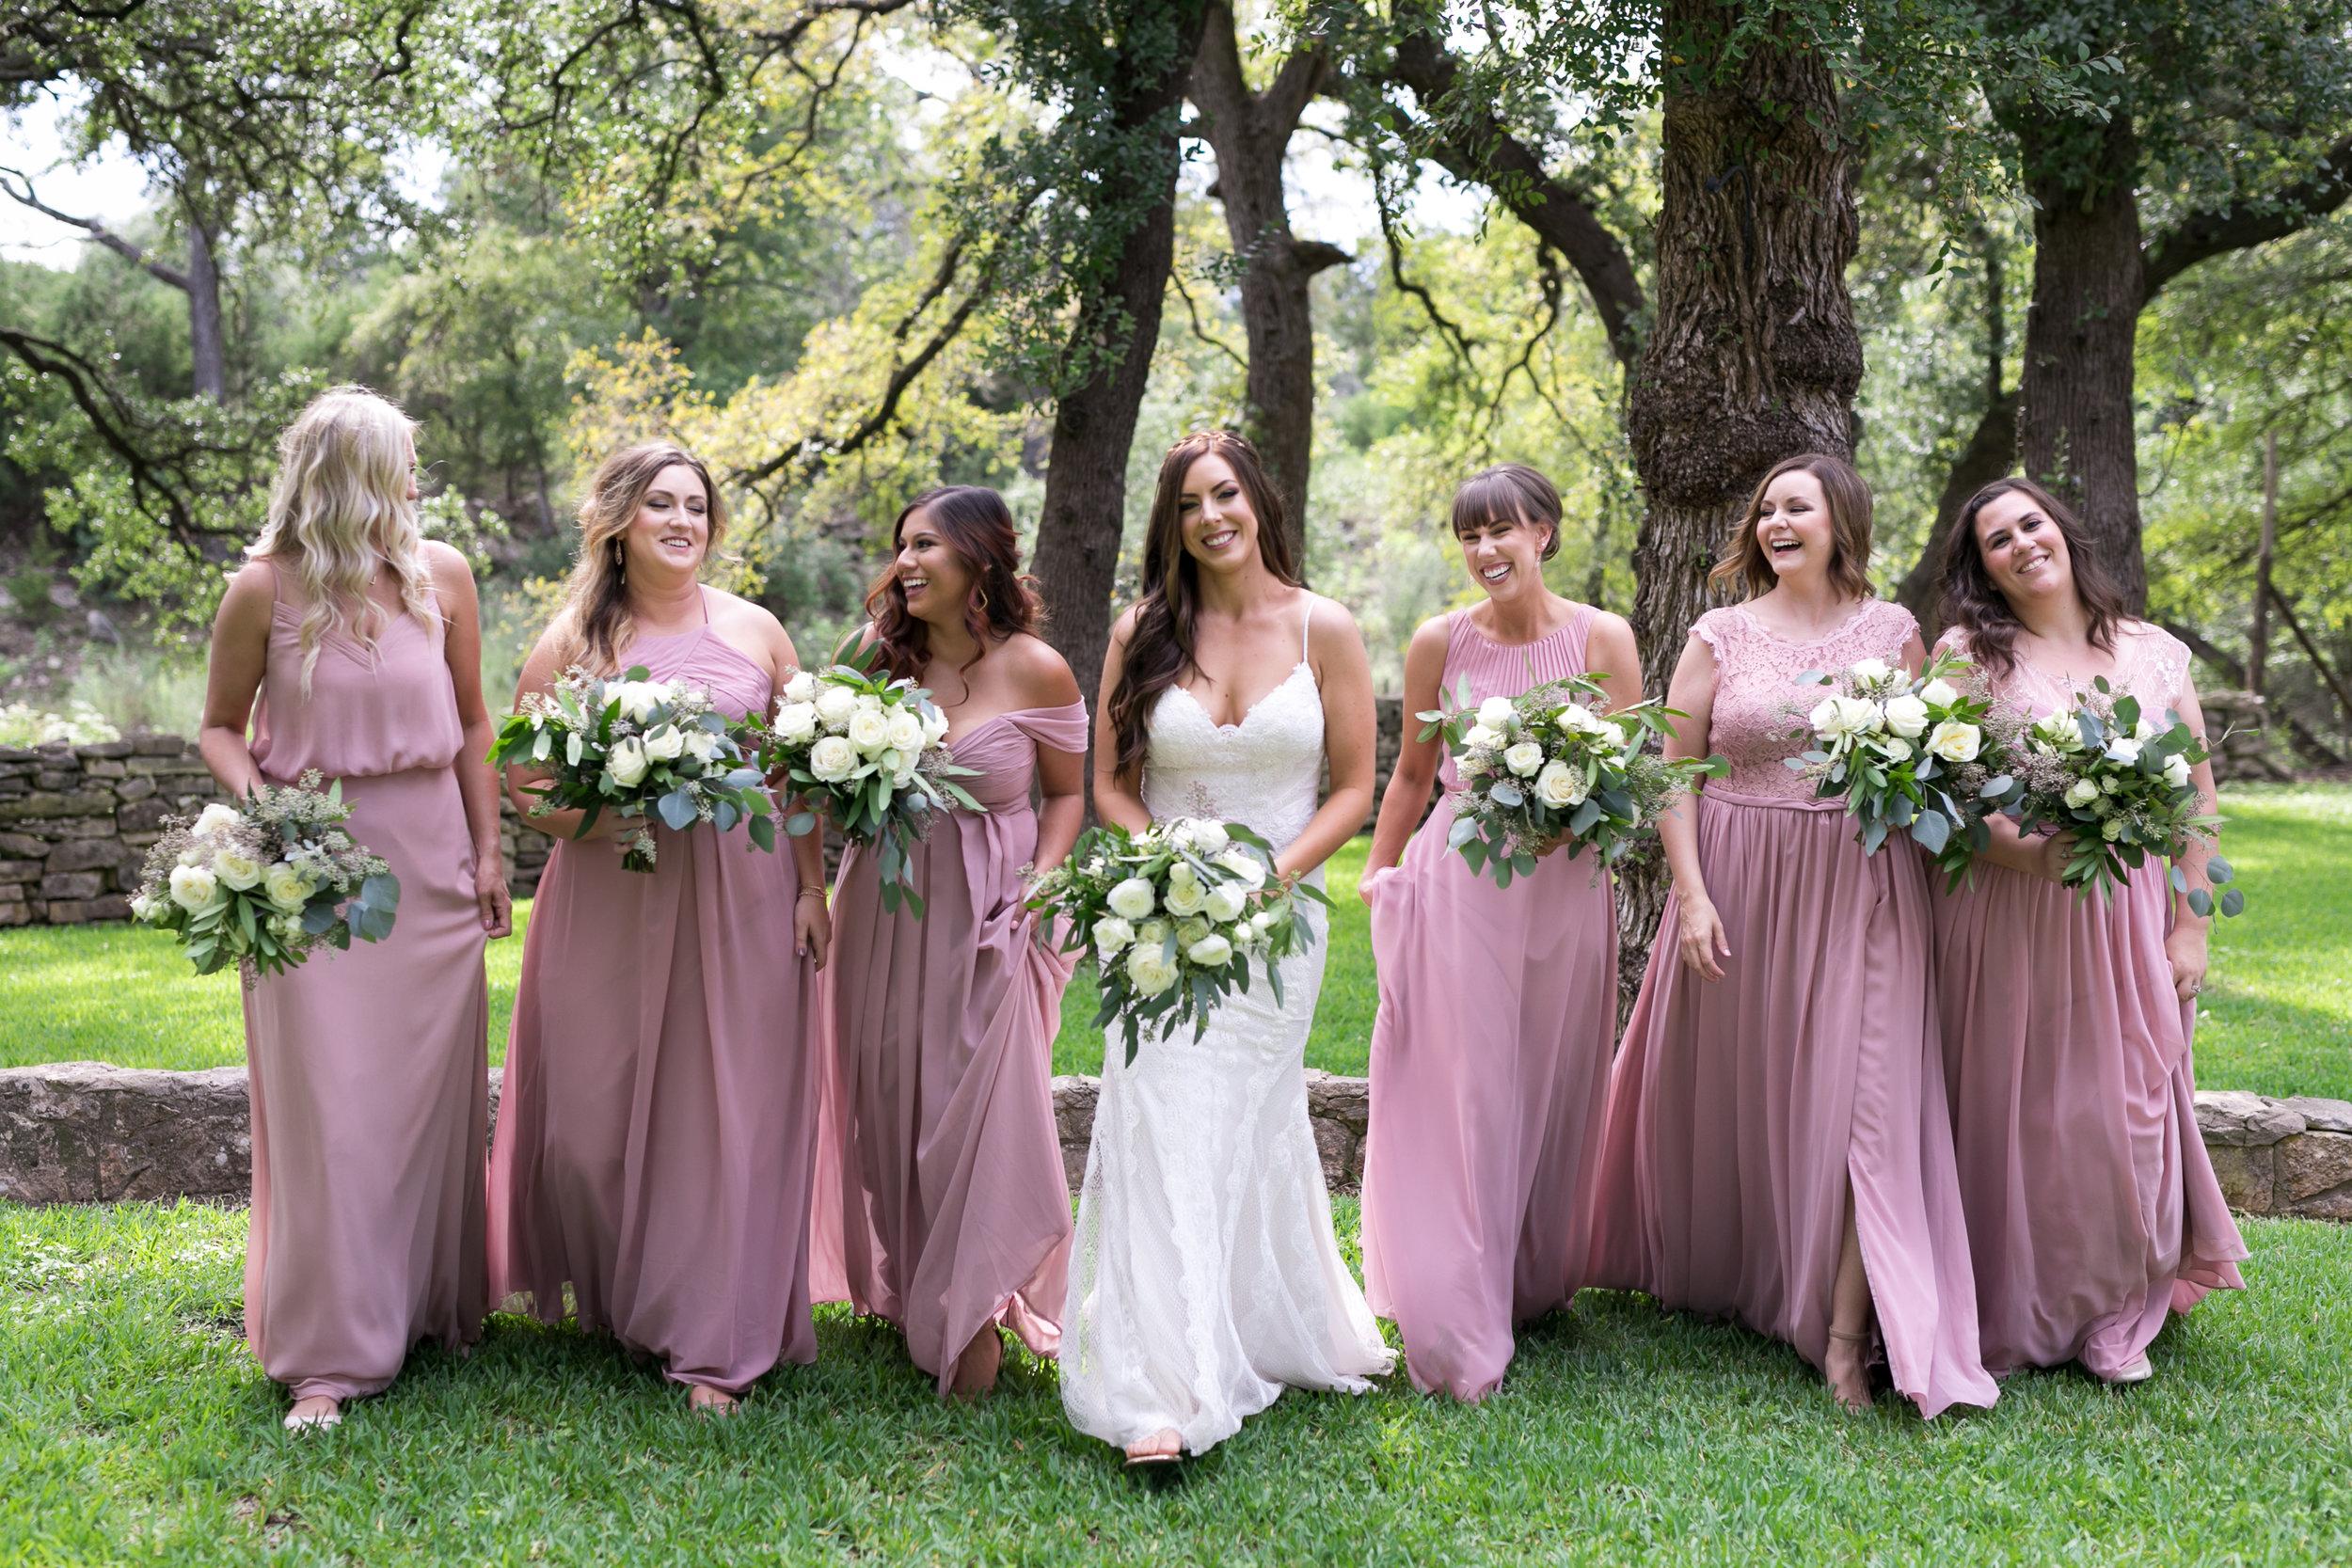 Addison-grove-wedding-dripping-springs-001.jpg